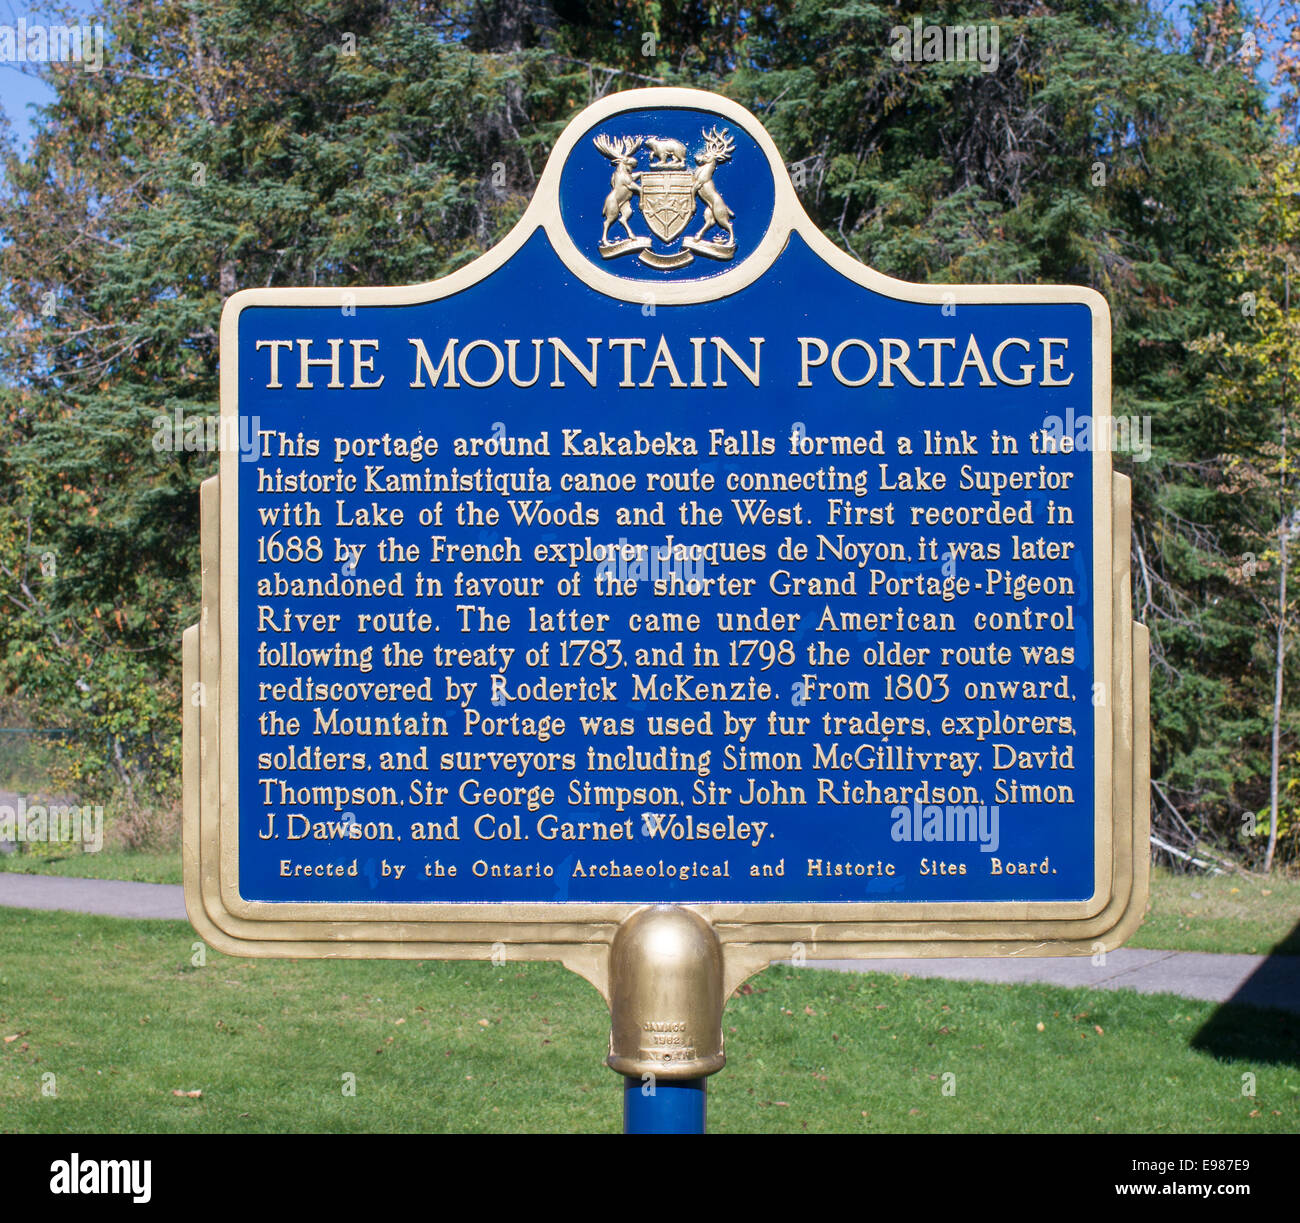 Sign The Mountain Portage at Kakabeka Falls, Ontario, Canada - Stock Image